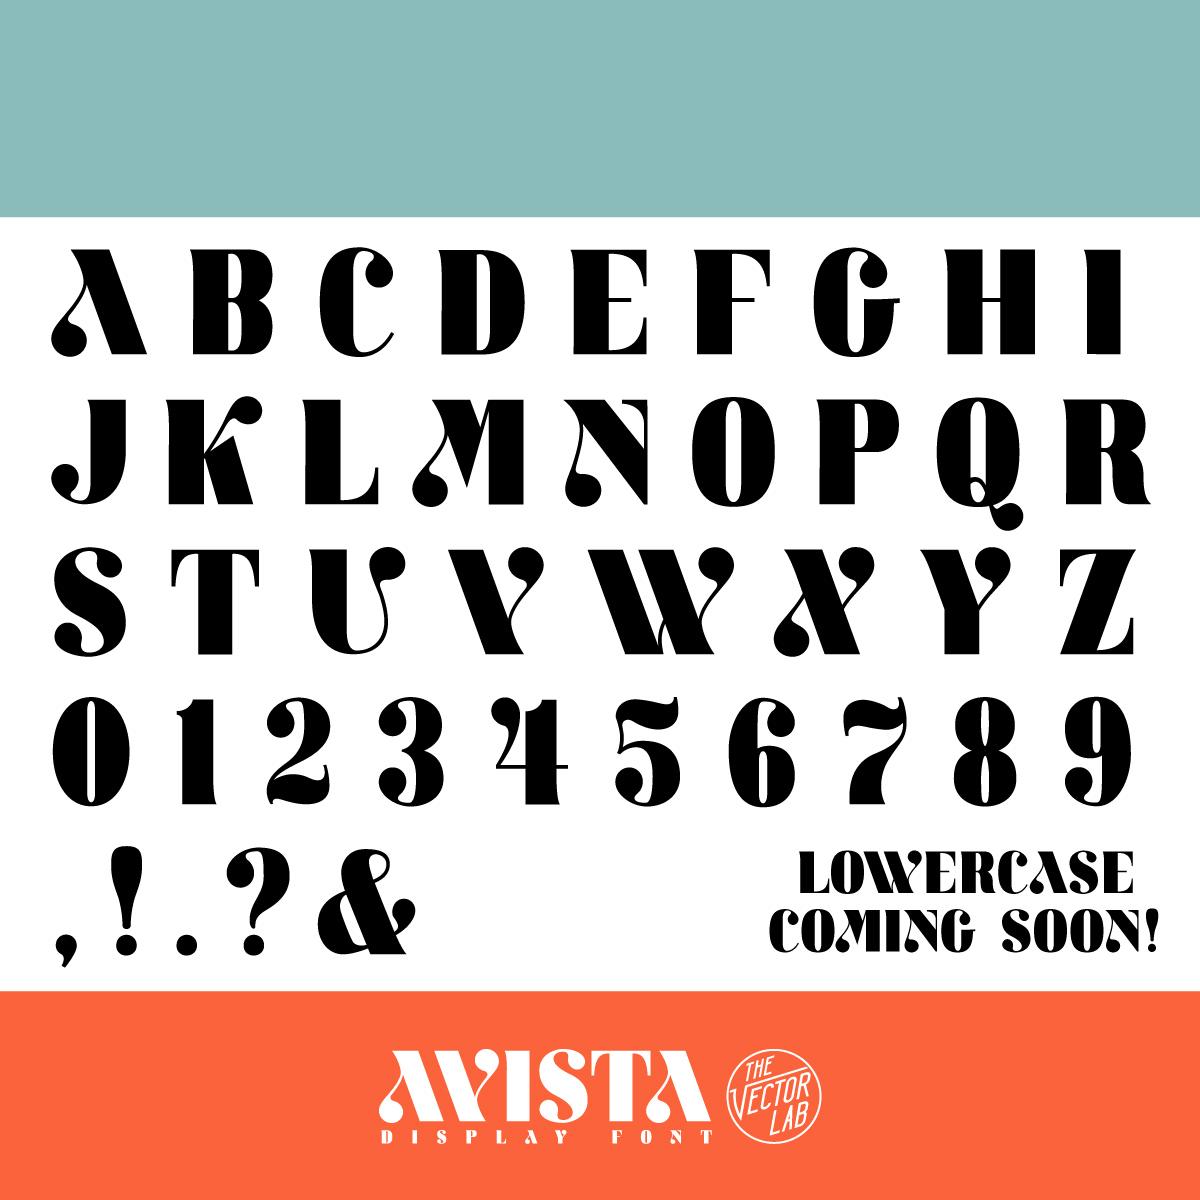 AVISTA font by Ray Dombroski & TheVectorLab